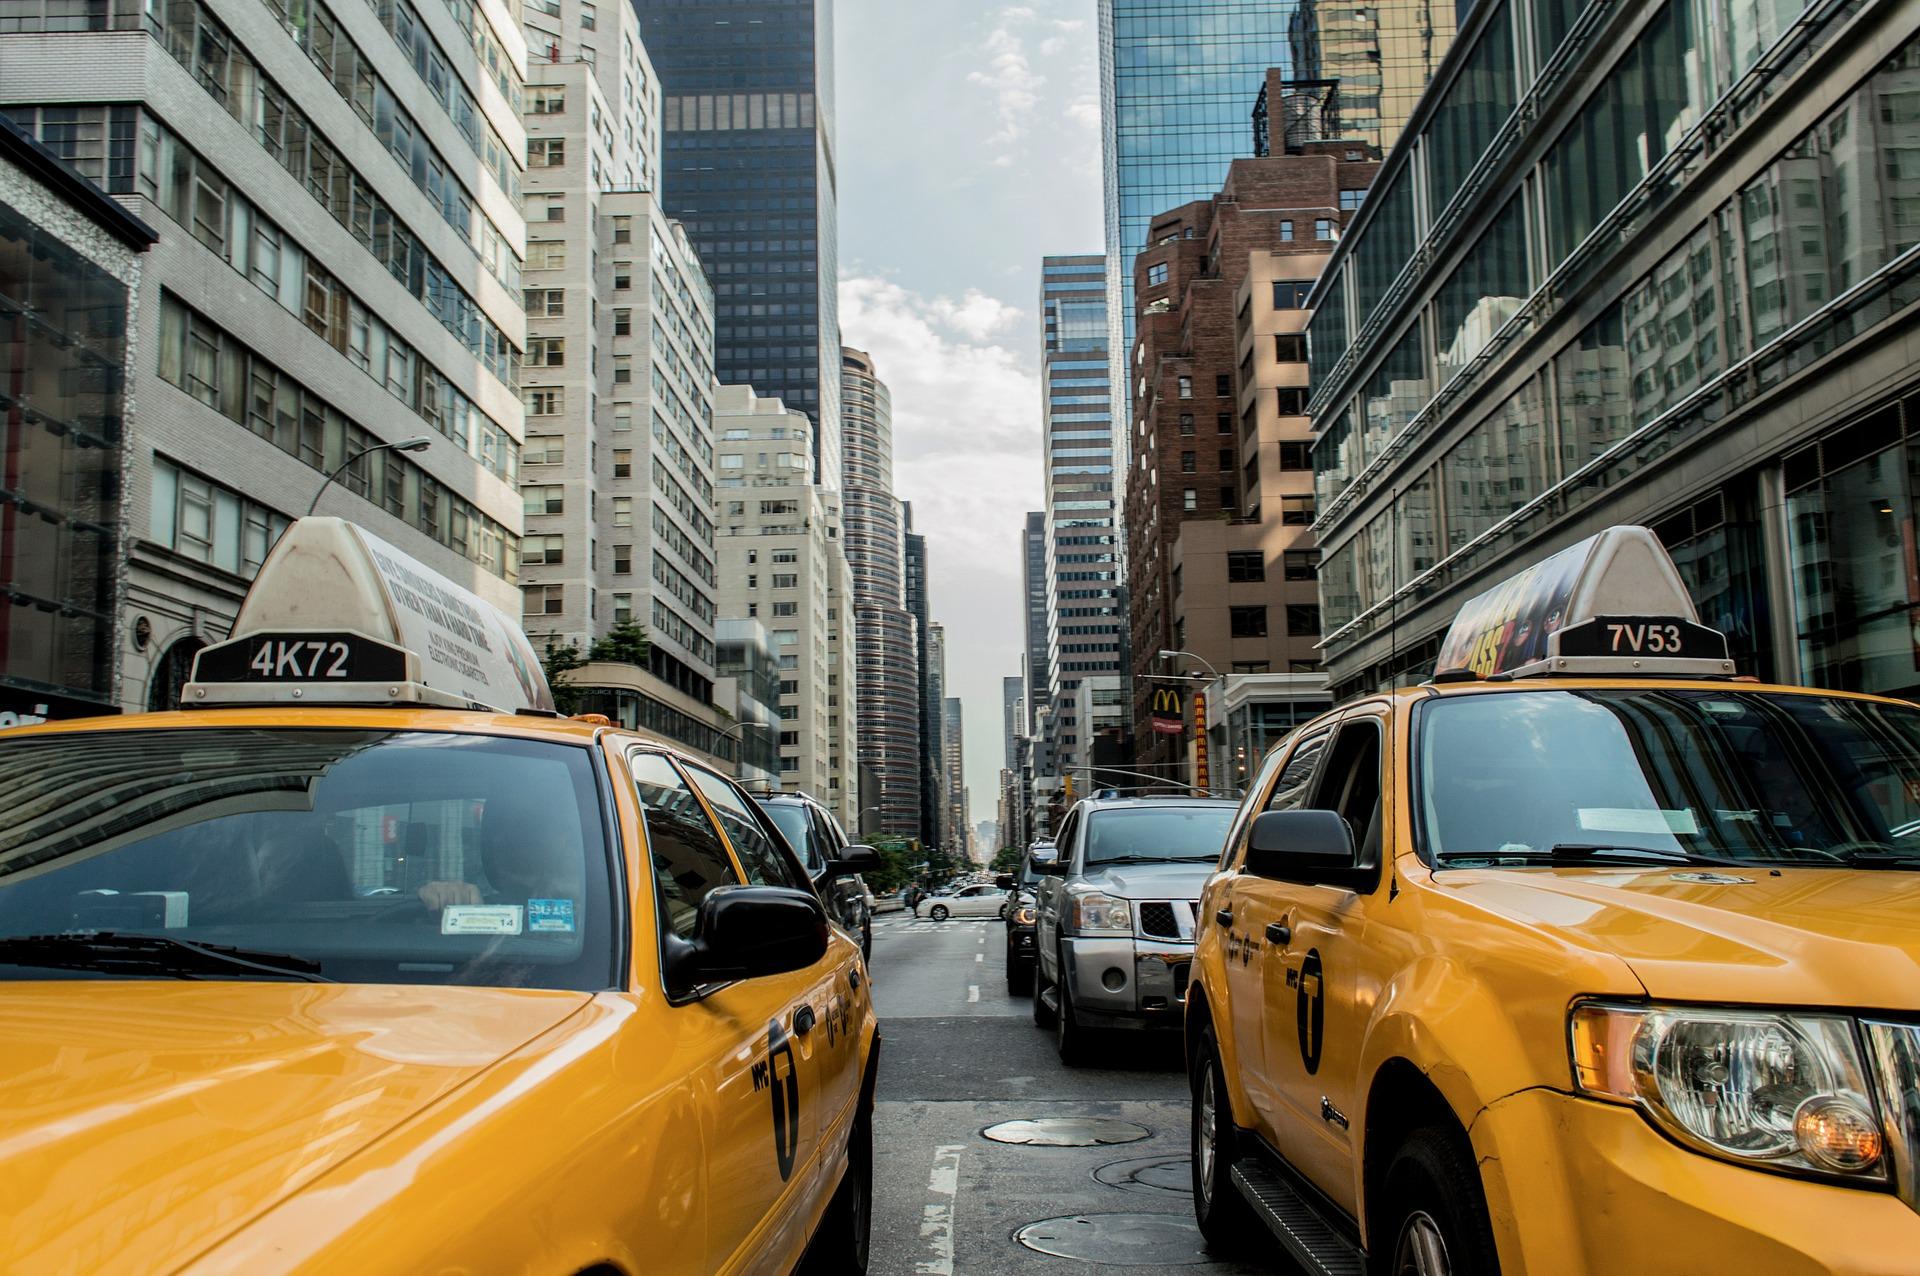 taxi-cab-new york usa